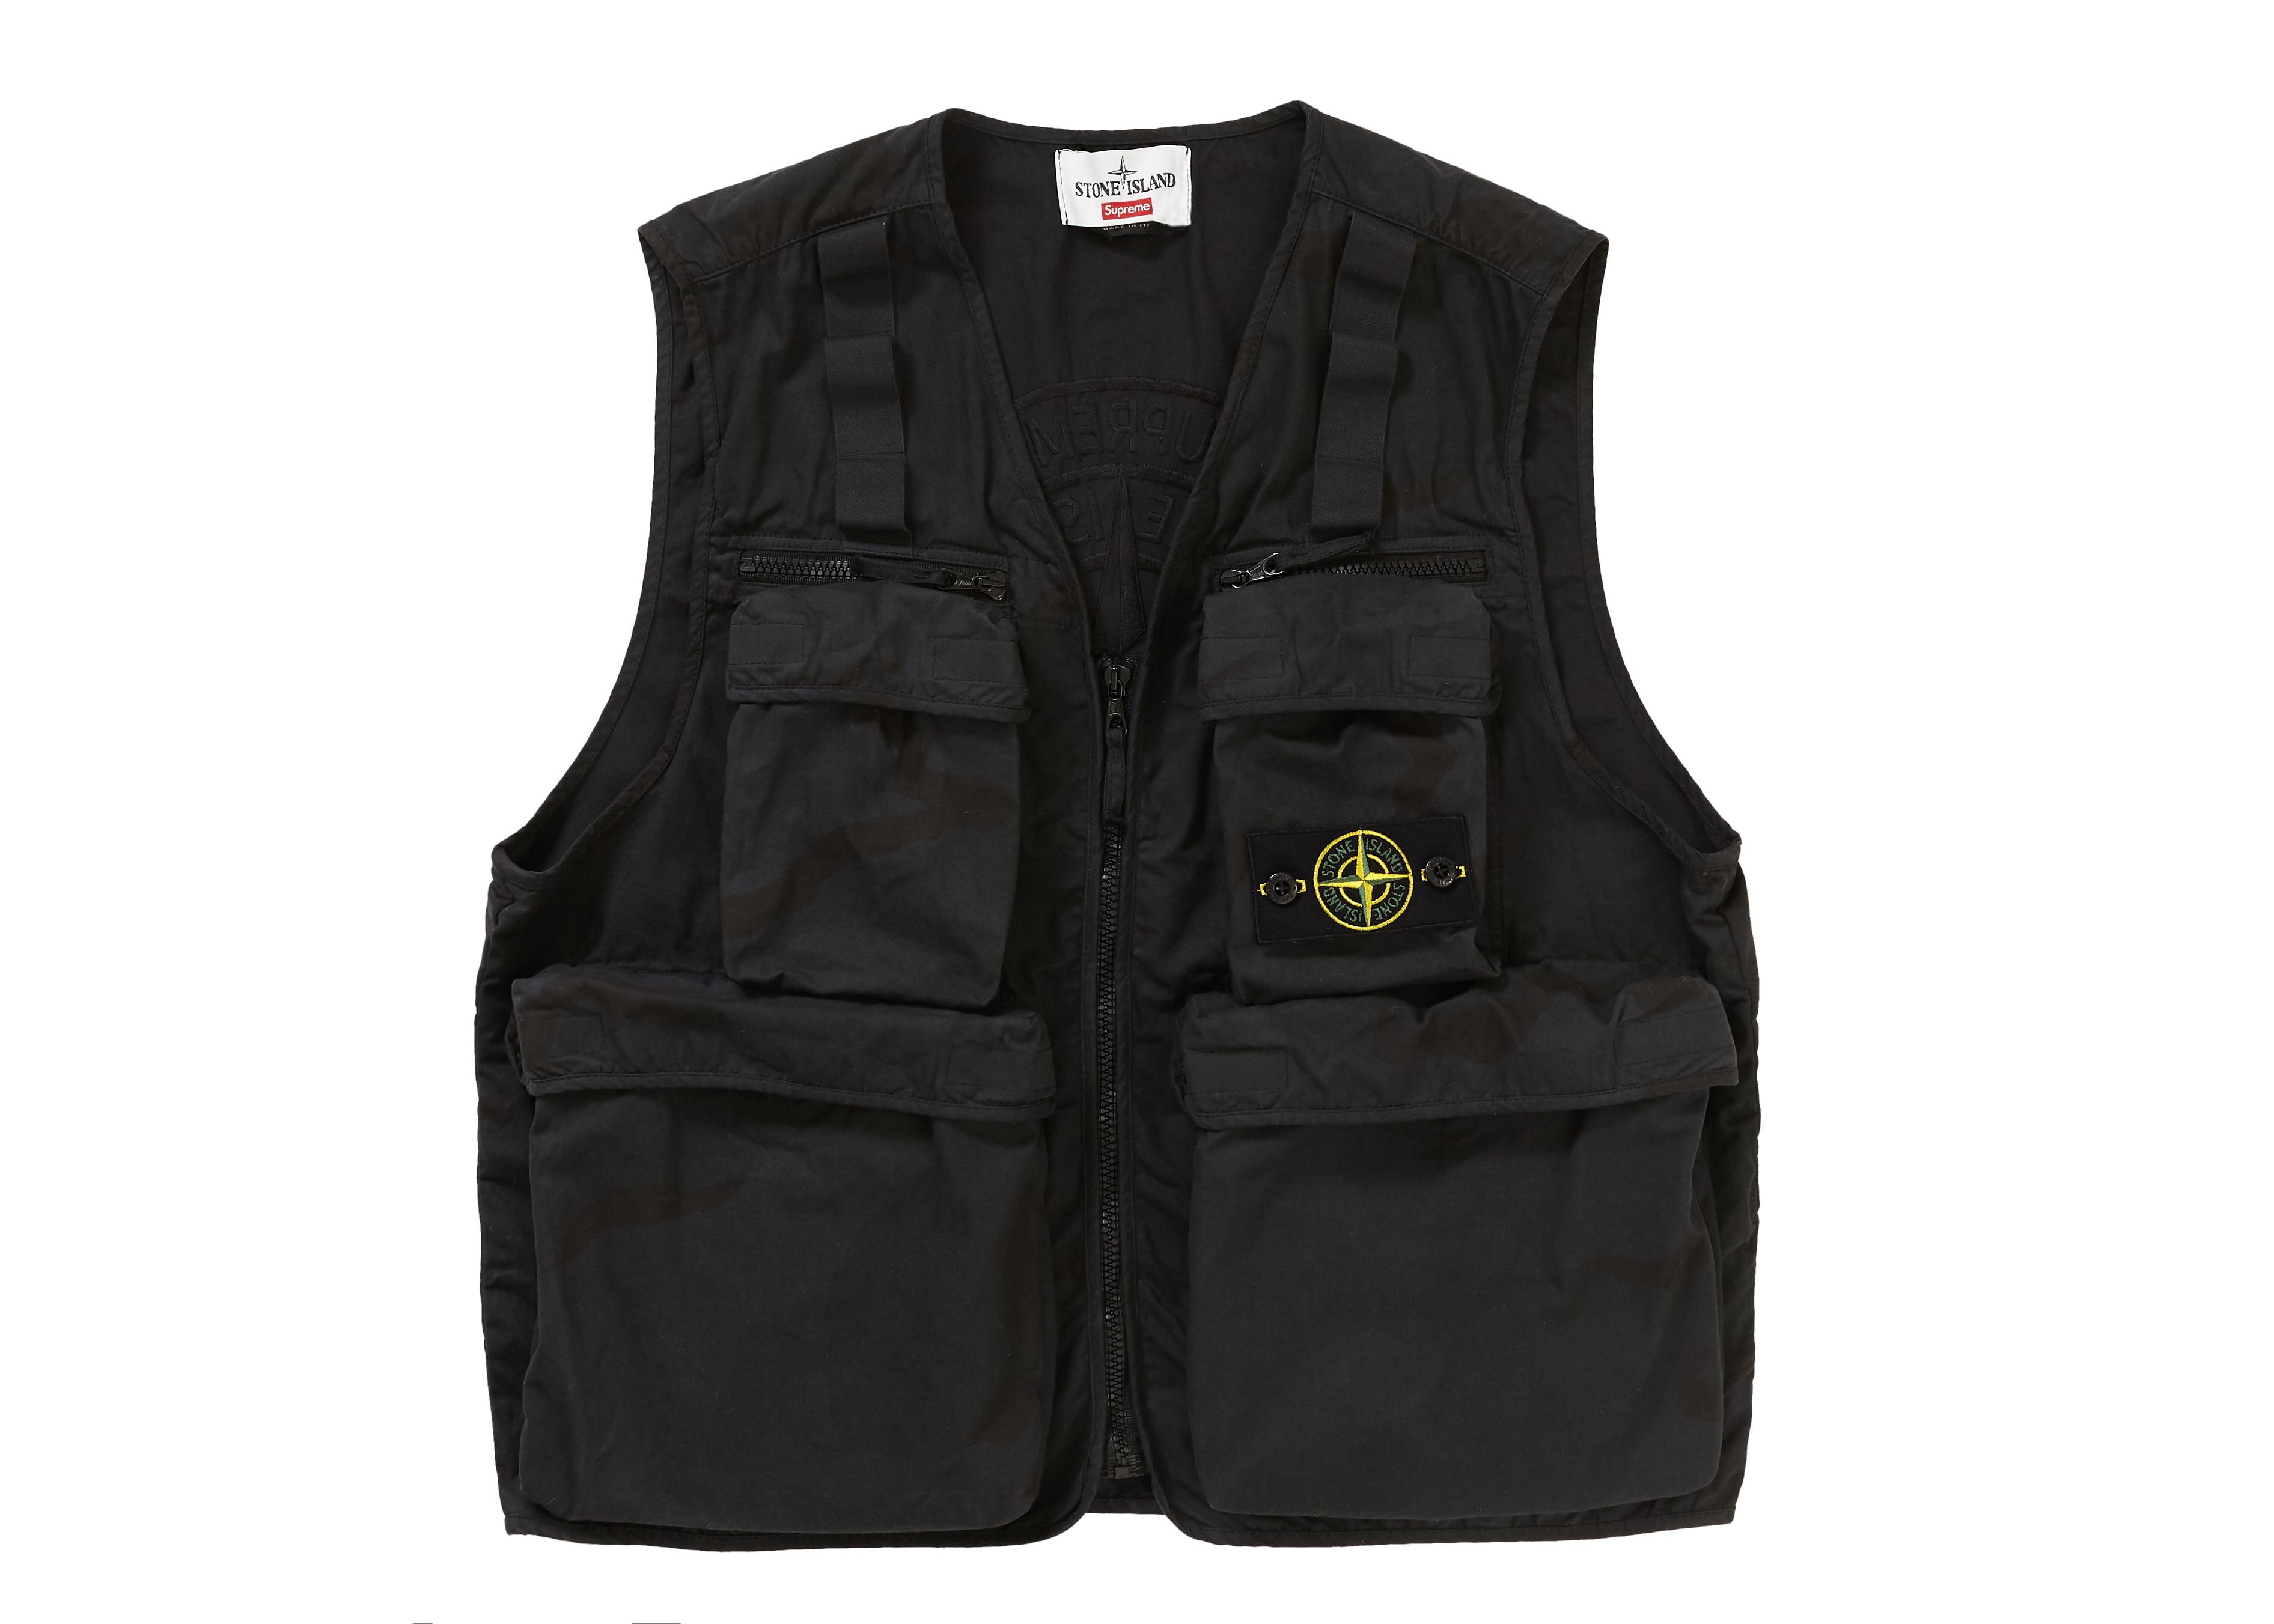 dd863a63d6dc1 Tap to visit site. Supreme - Stone Island Camo Cargo Vest Black Camo for Men  - Lyst